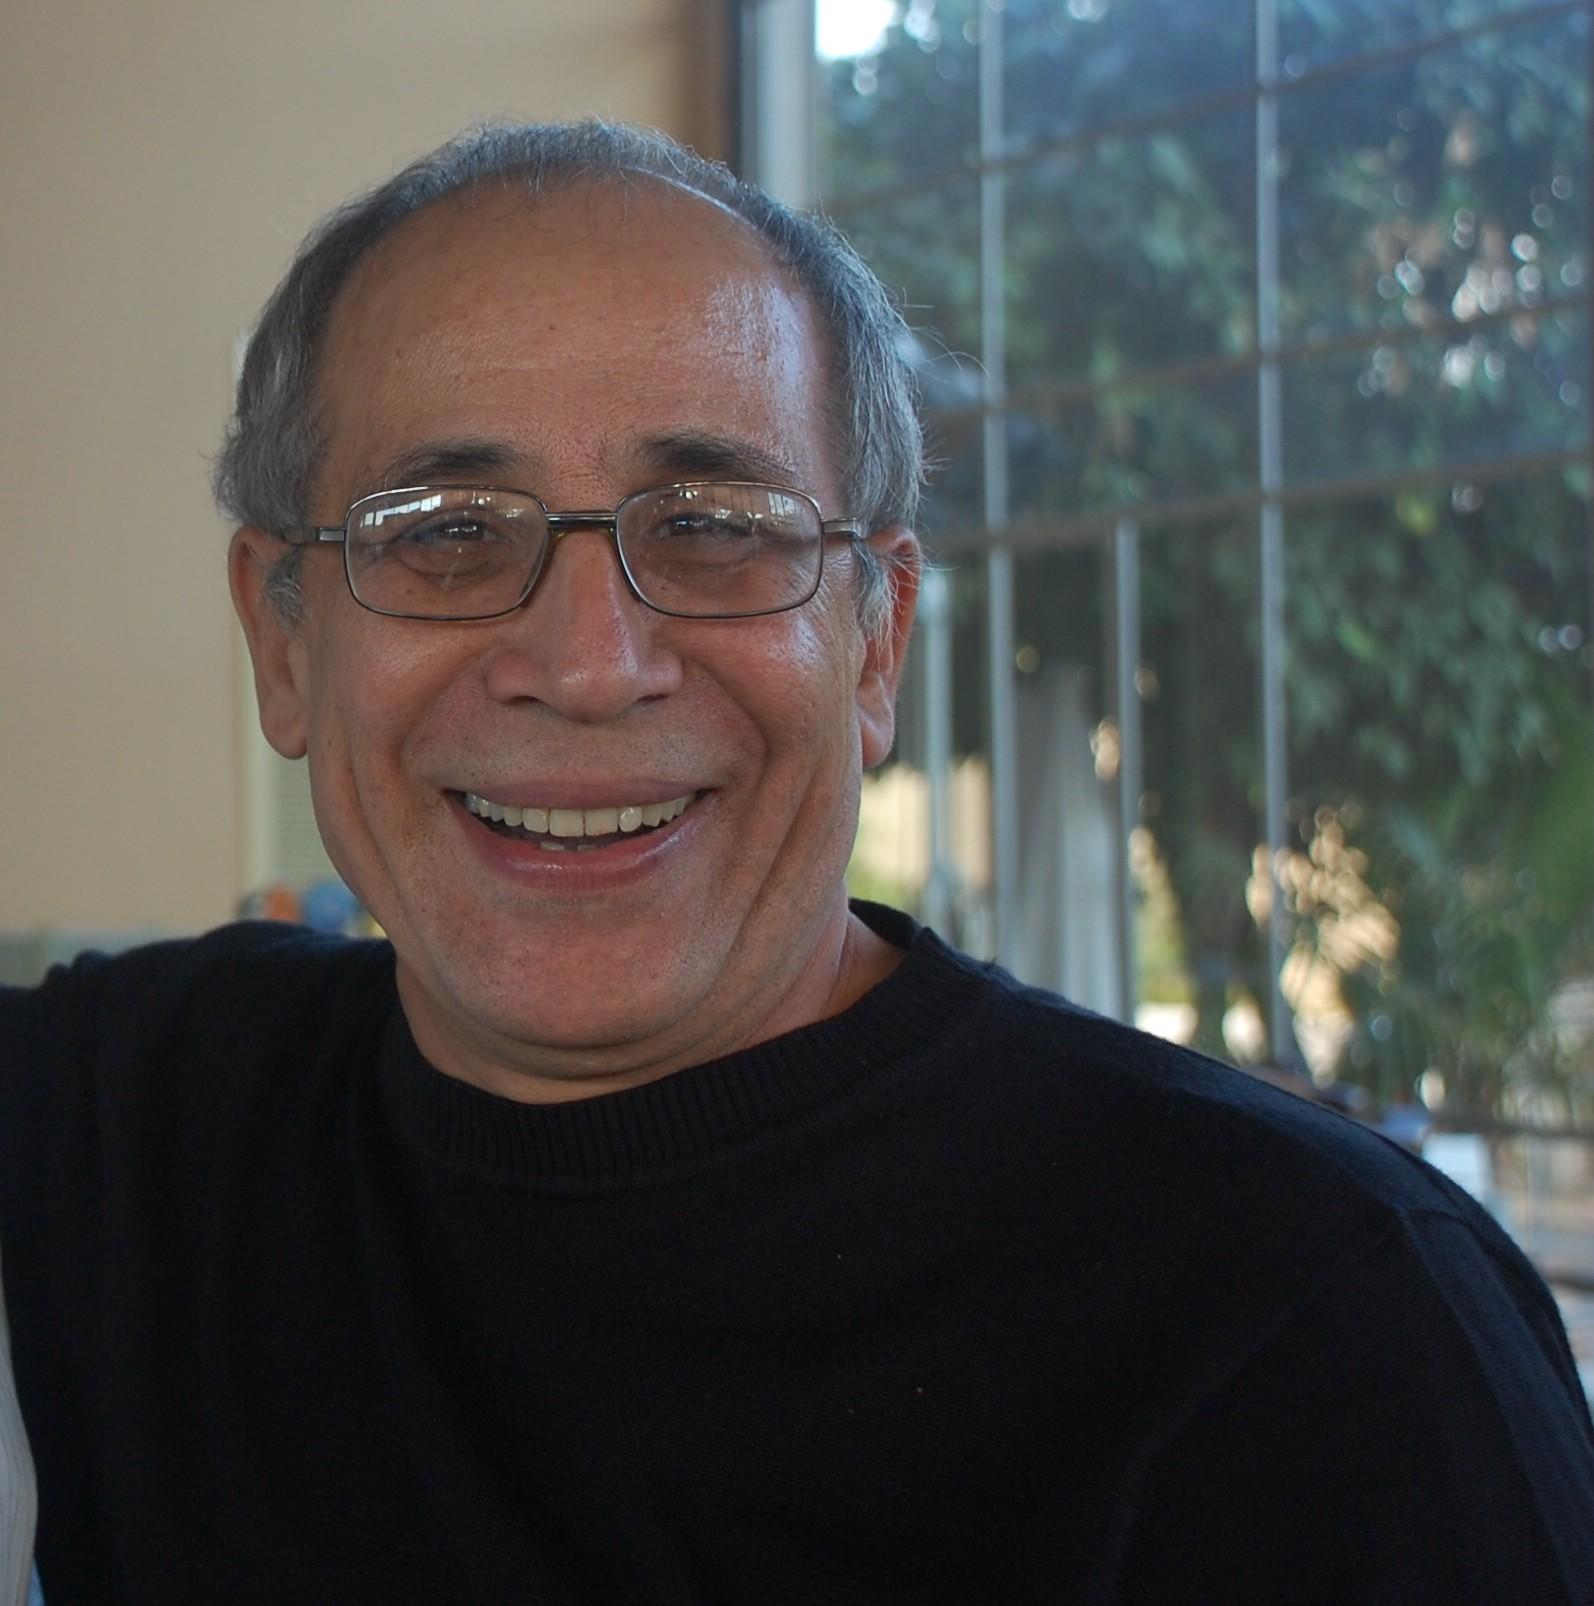 Yehuda Ben Harush